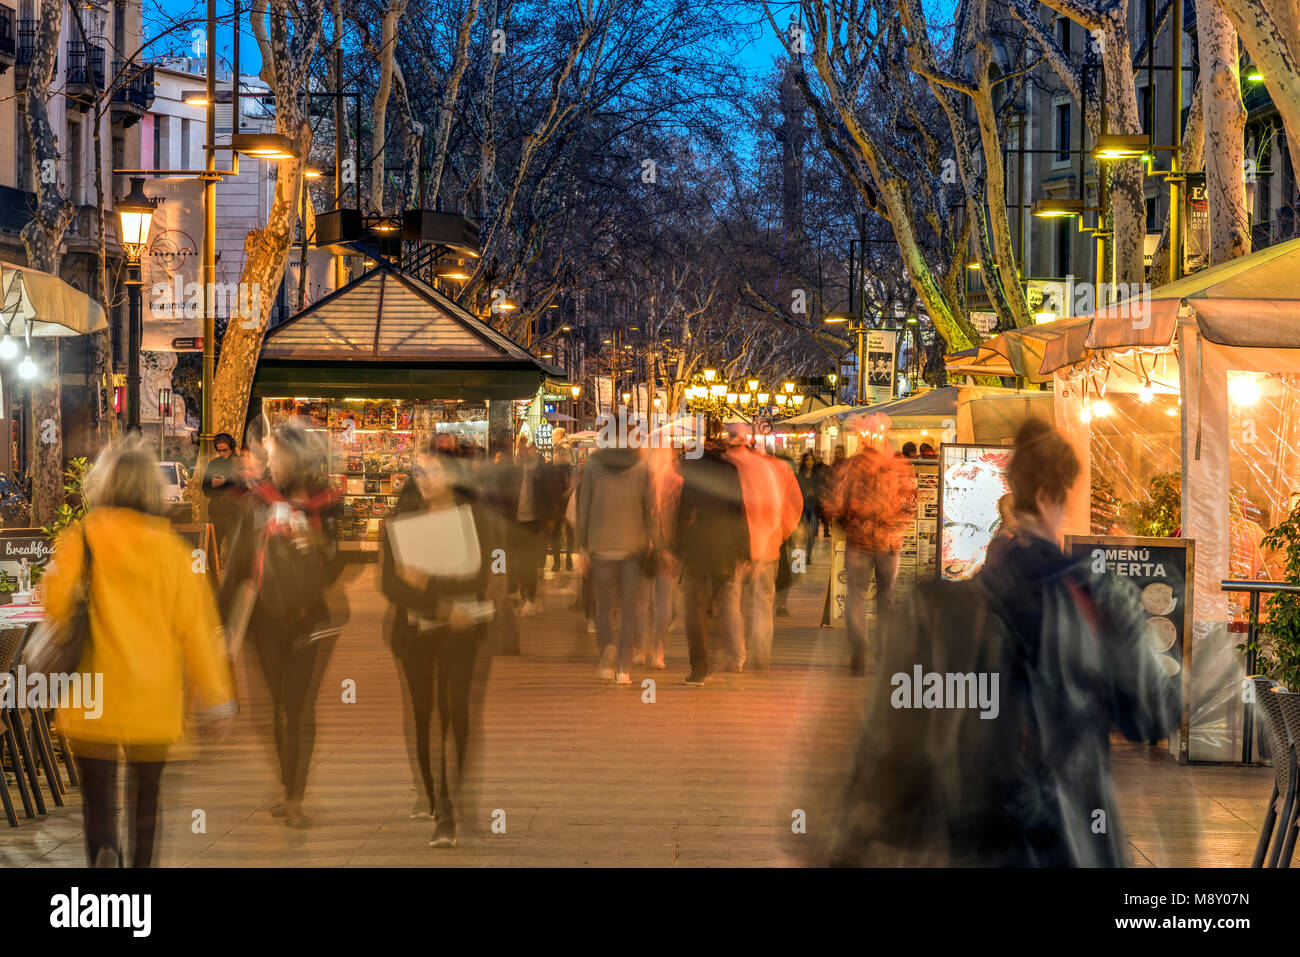 Tourists strolling along the worldwide famous Rambla pedestrian mall, Barcelona, Catalonia, Spain - Stock Image